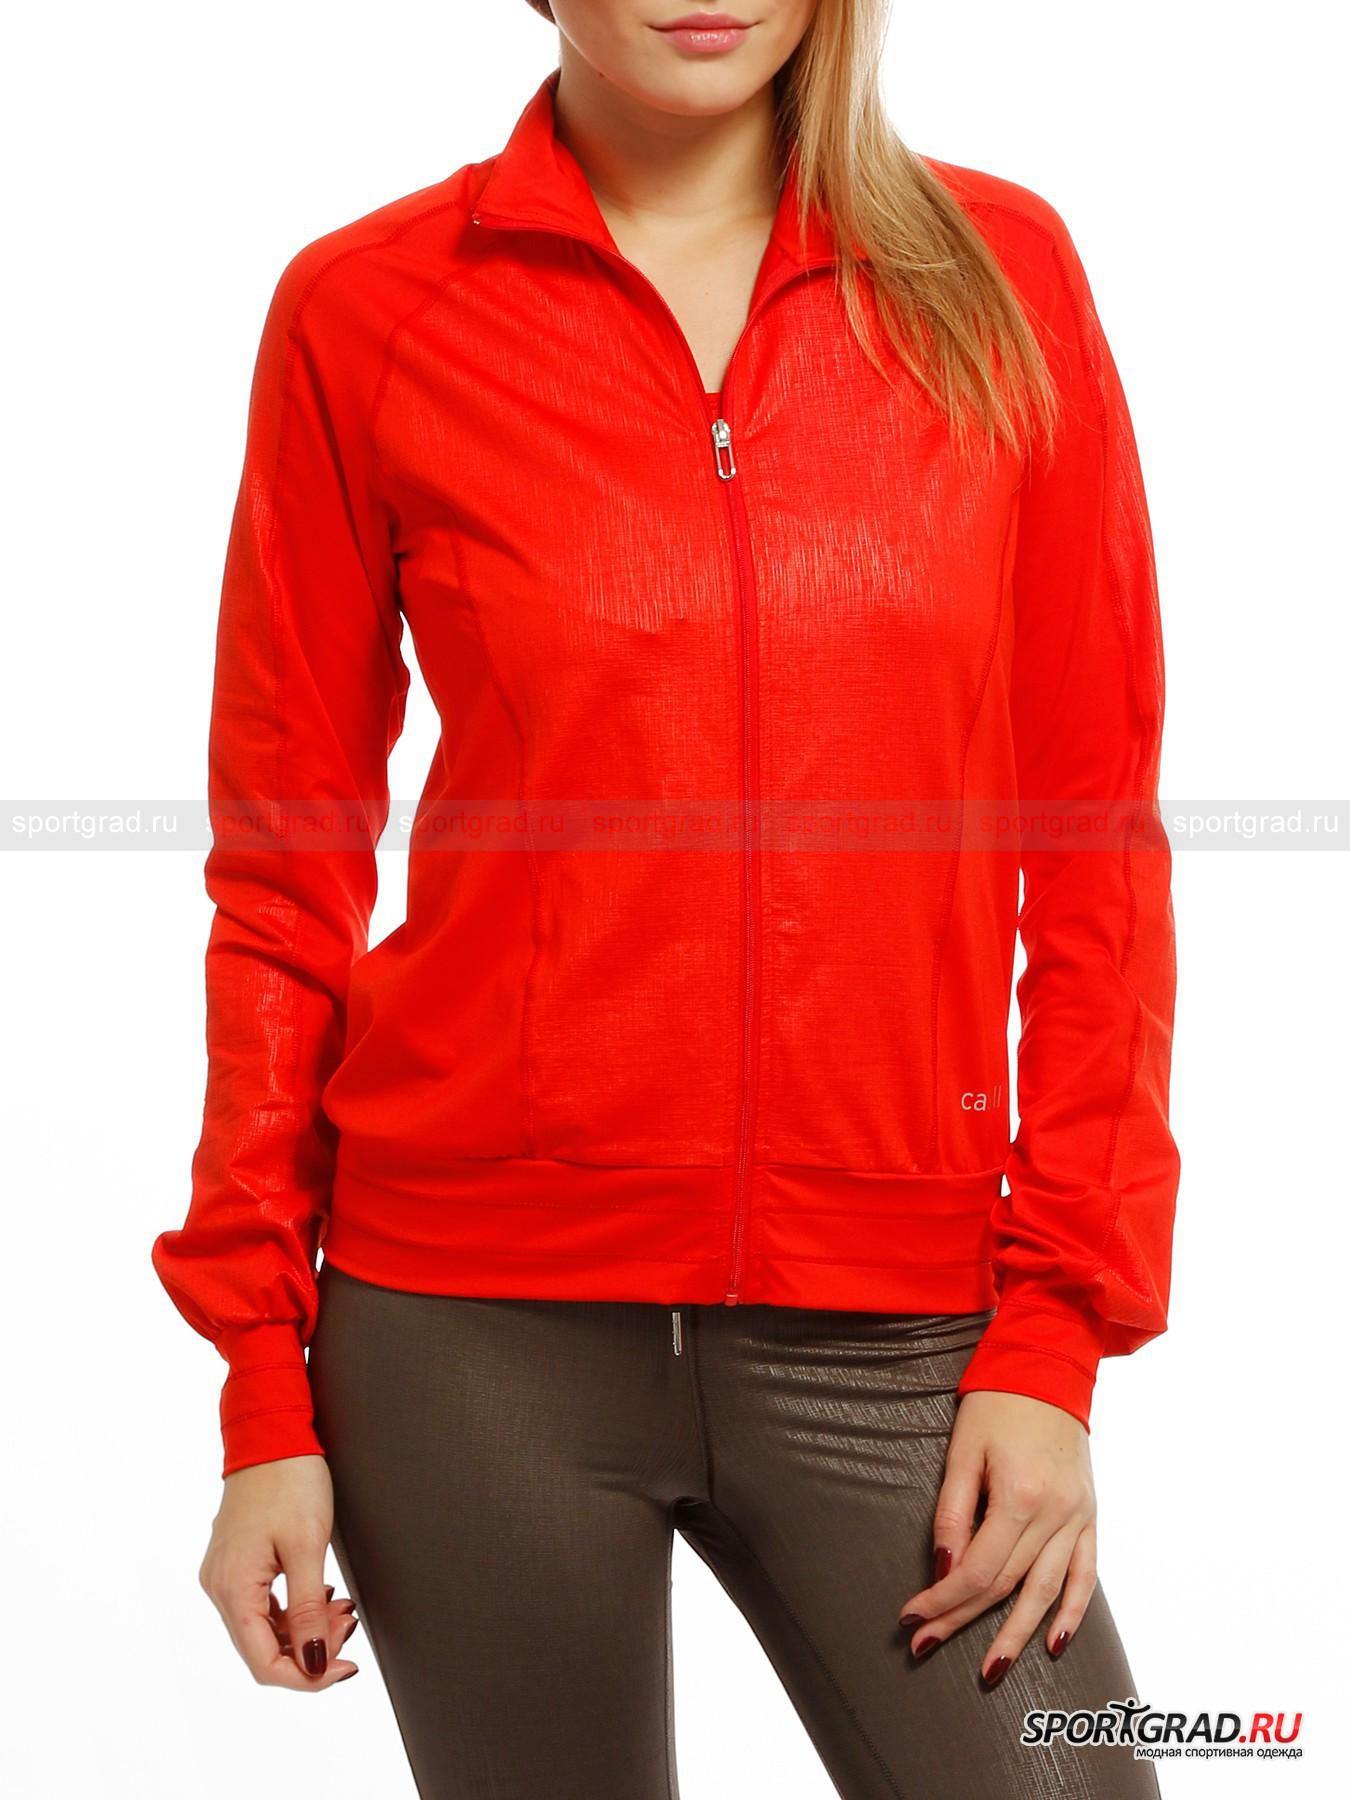 ��������� ������� Heat jacket CASALL